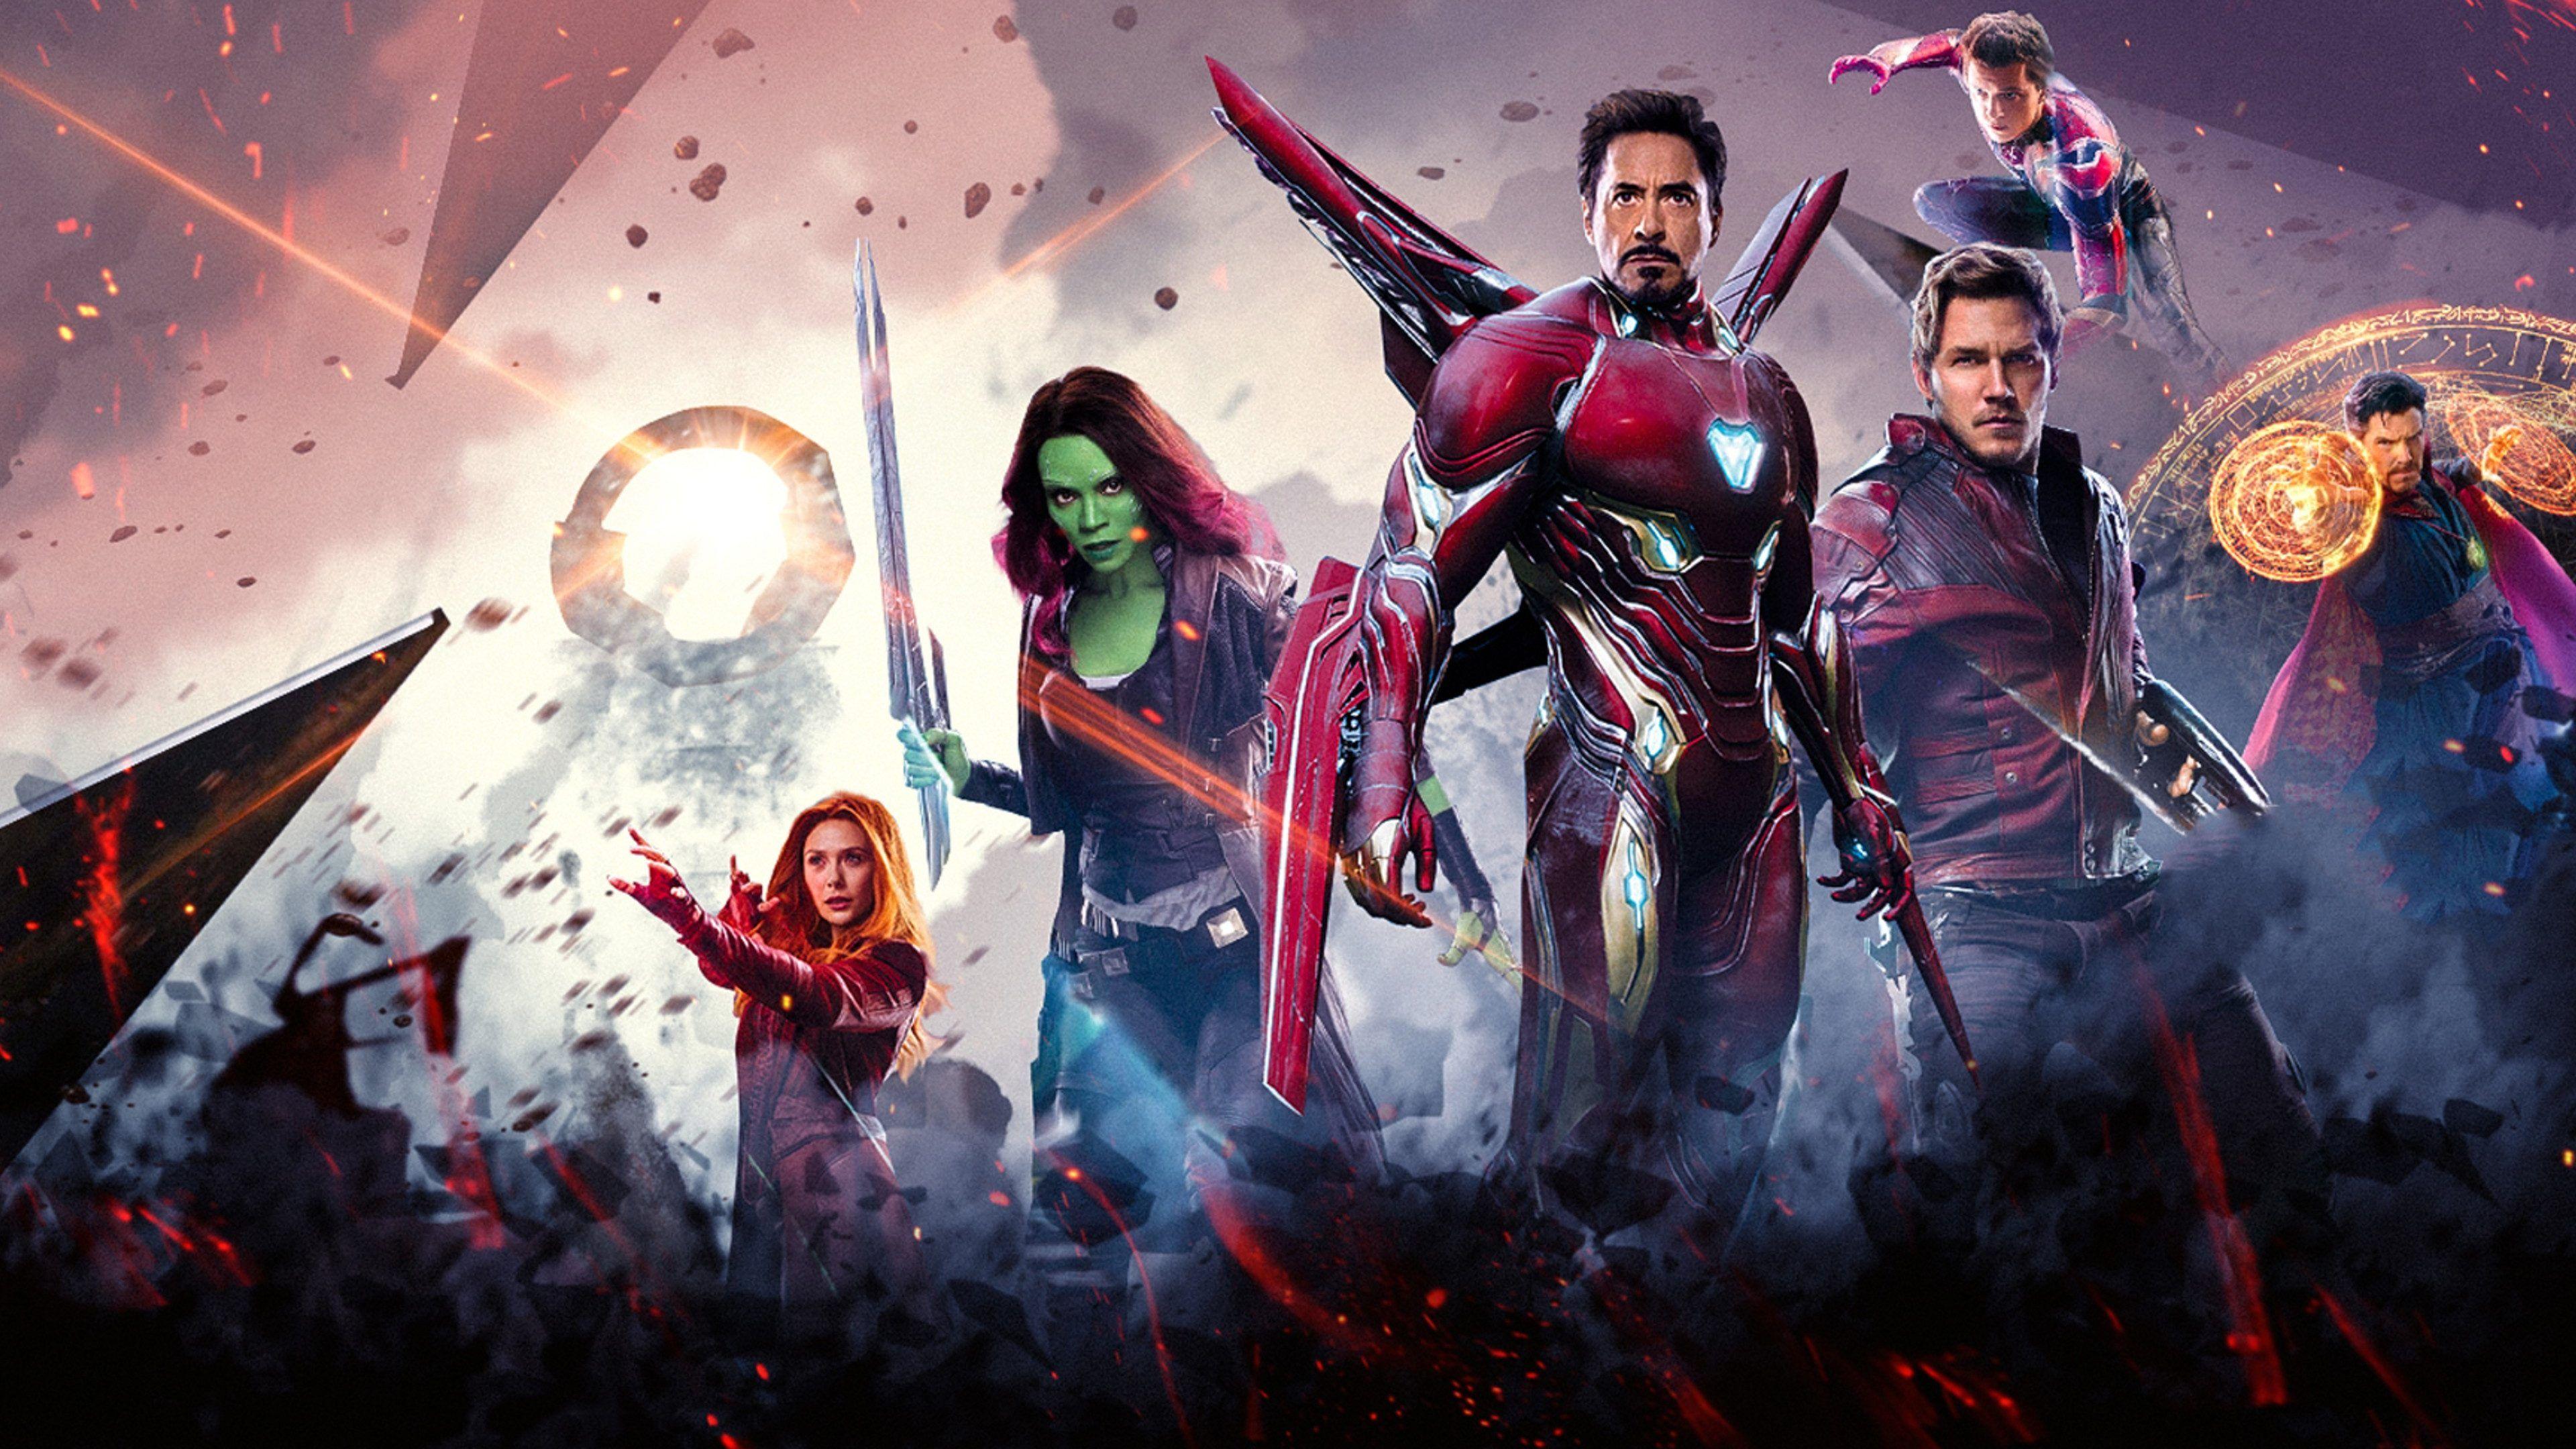 Super Heroes In Avengers Infinity War 4k Wallpaper Avengers Infinity War Avengers Avengers Pictures